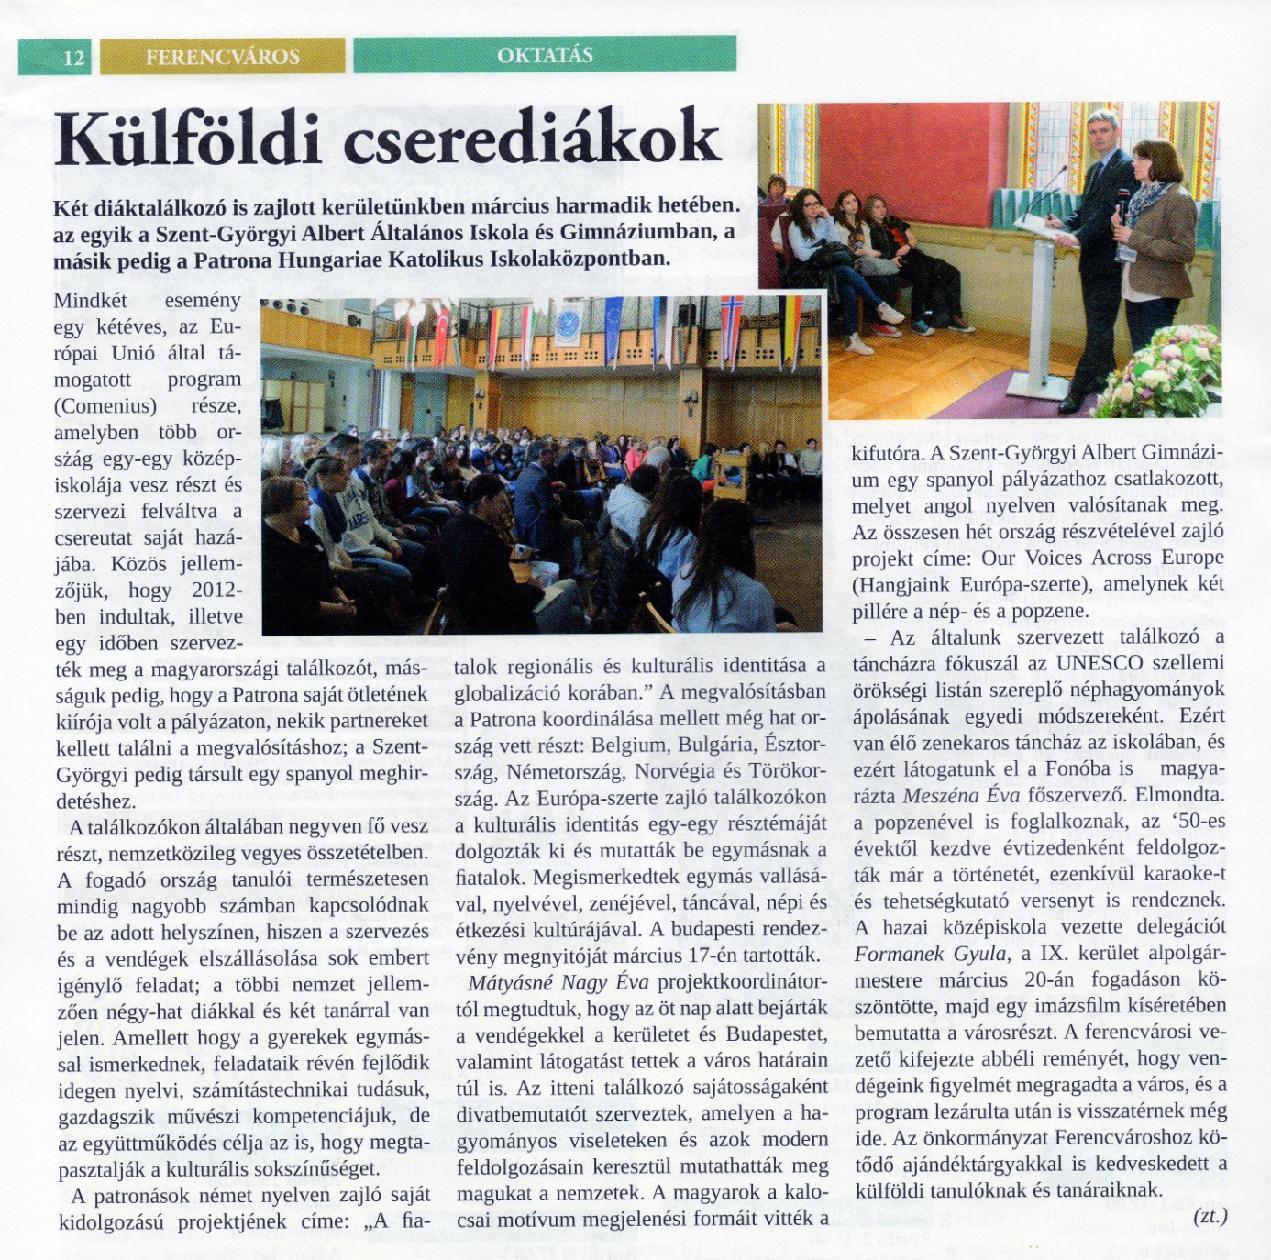 F:\Mama\Comenius\Our Voices across Europe\Budapest\Ferencváros cikk_Comenius Bp 002.jpg